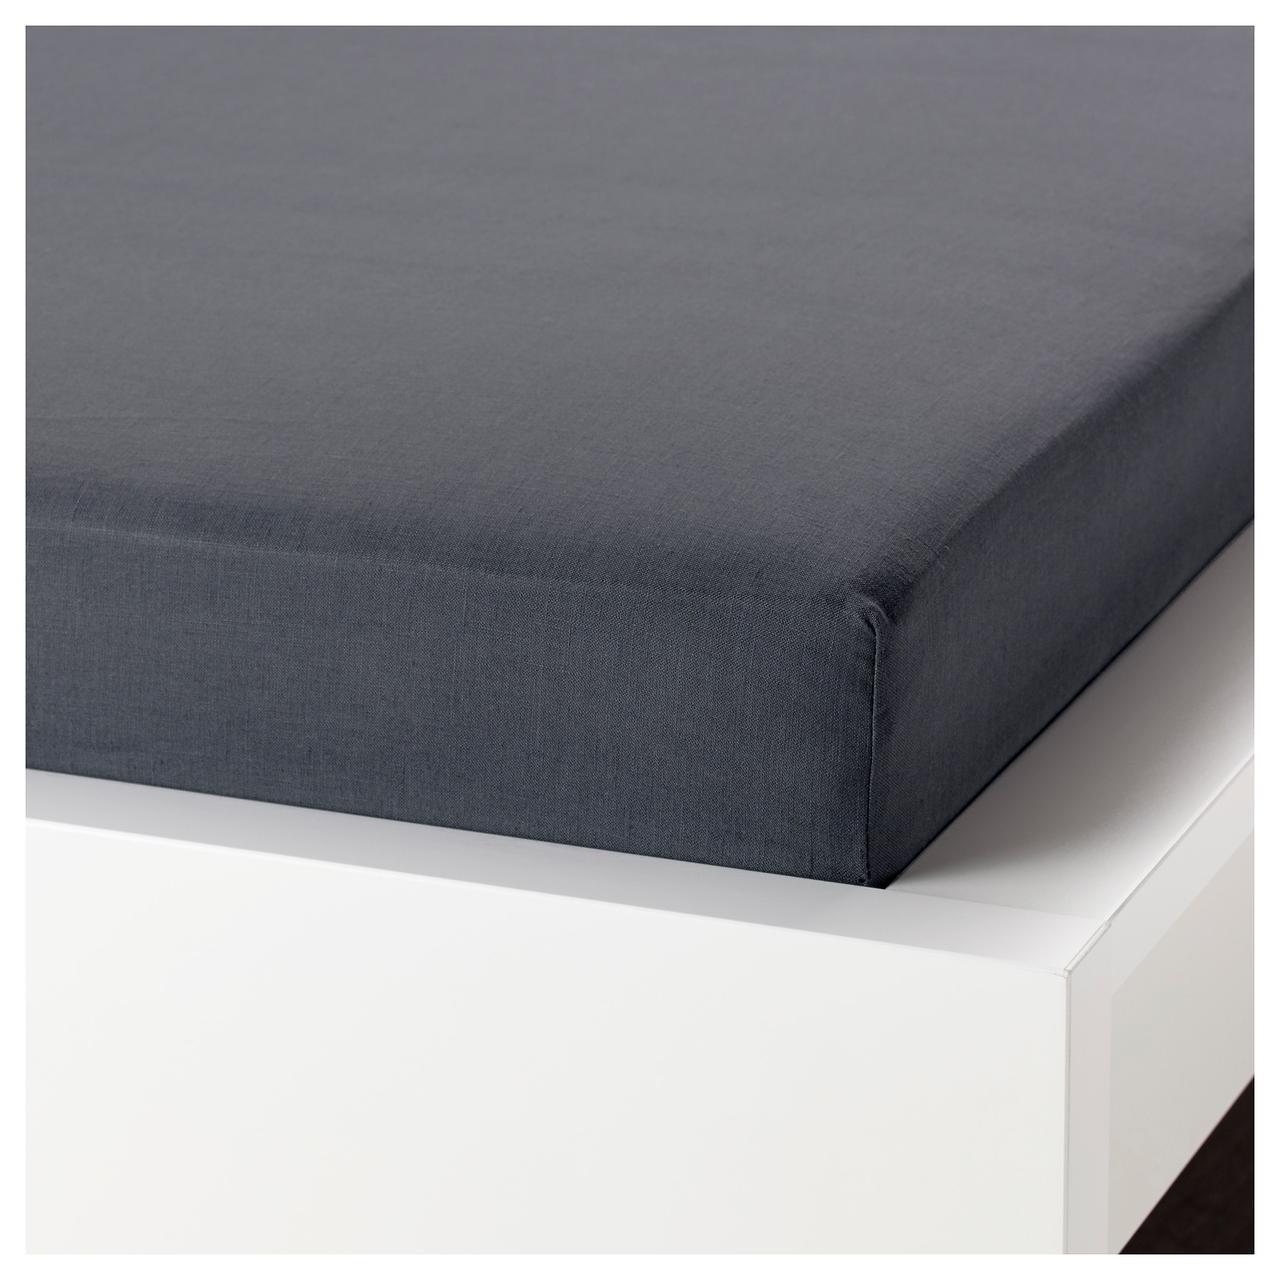 Простыня на резинке IKEA PUDERVIVA 140х200 см темно-серая 104.120.72